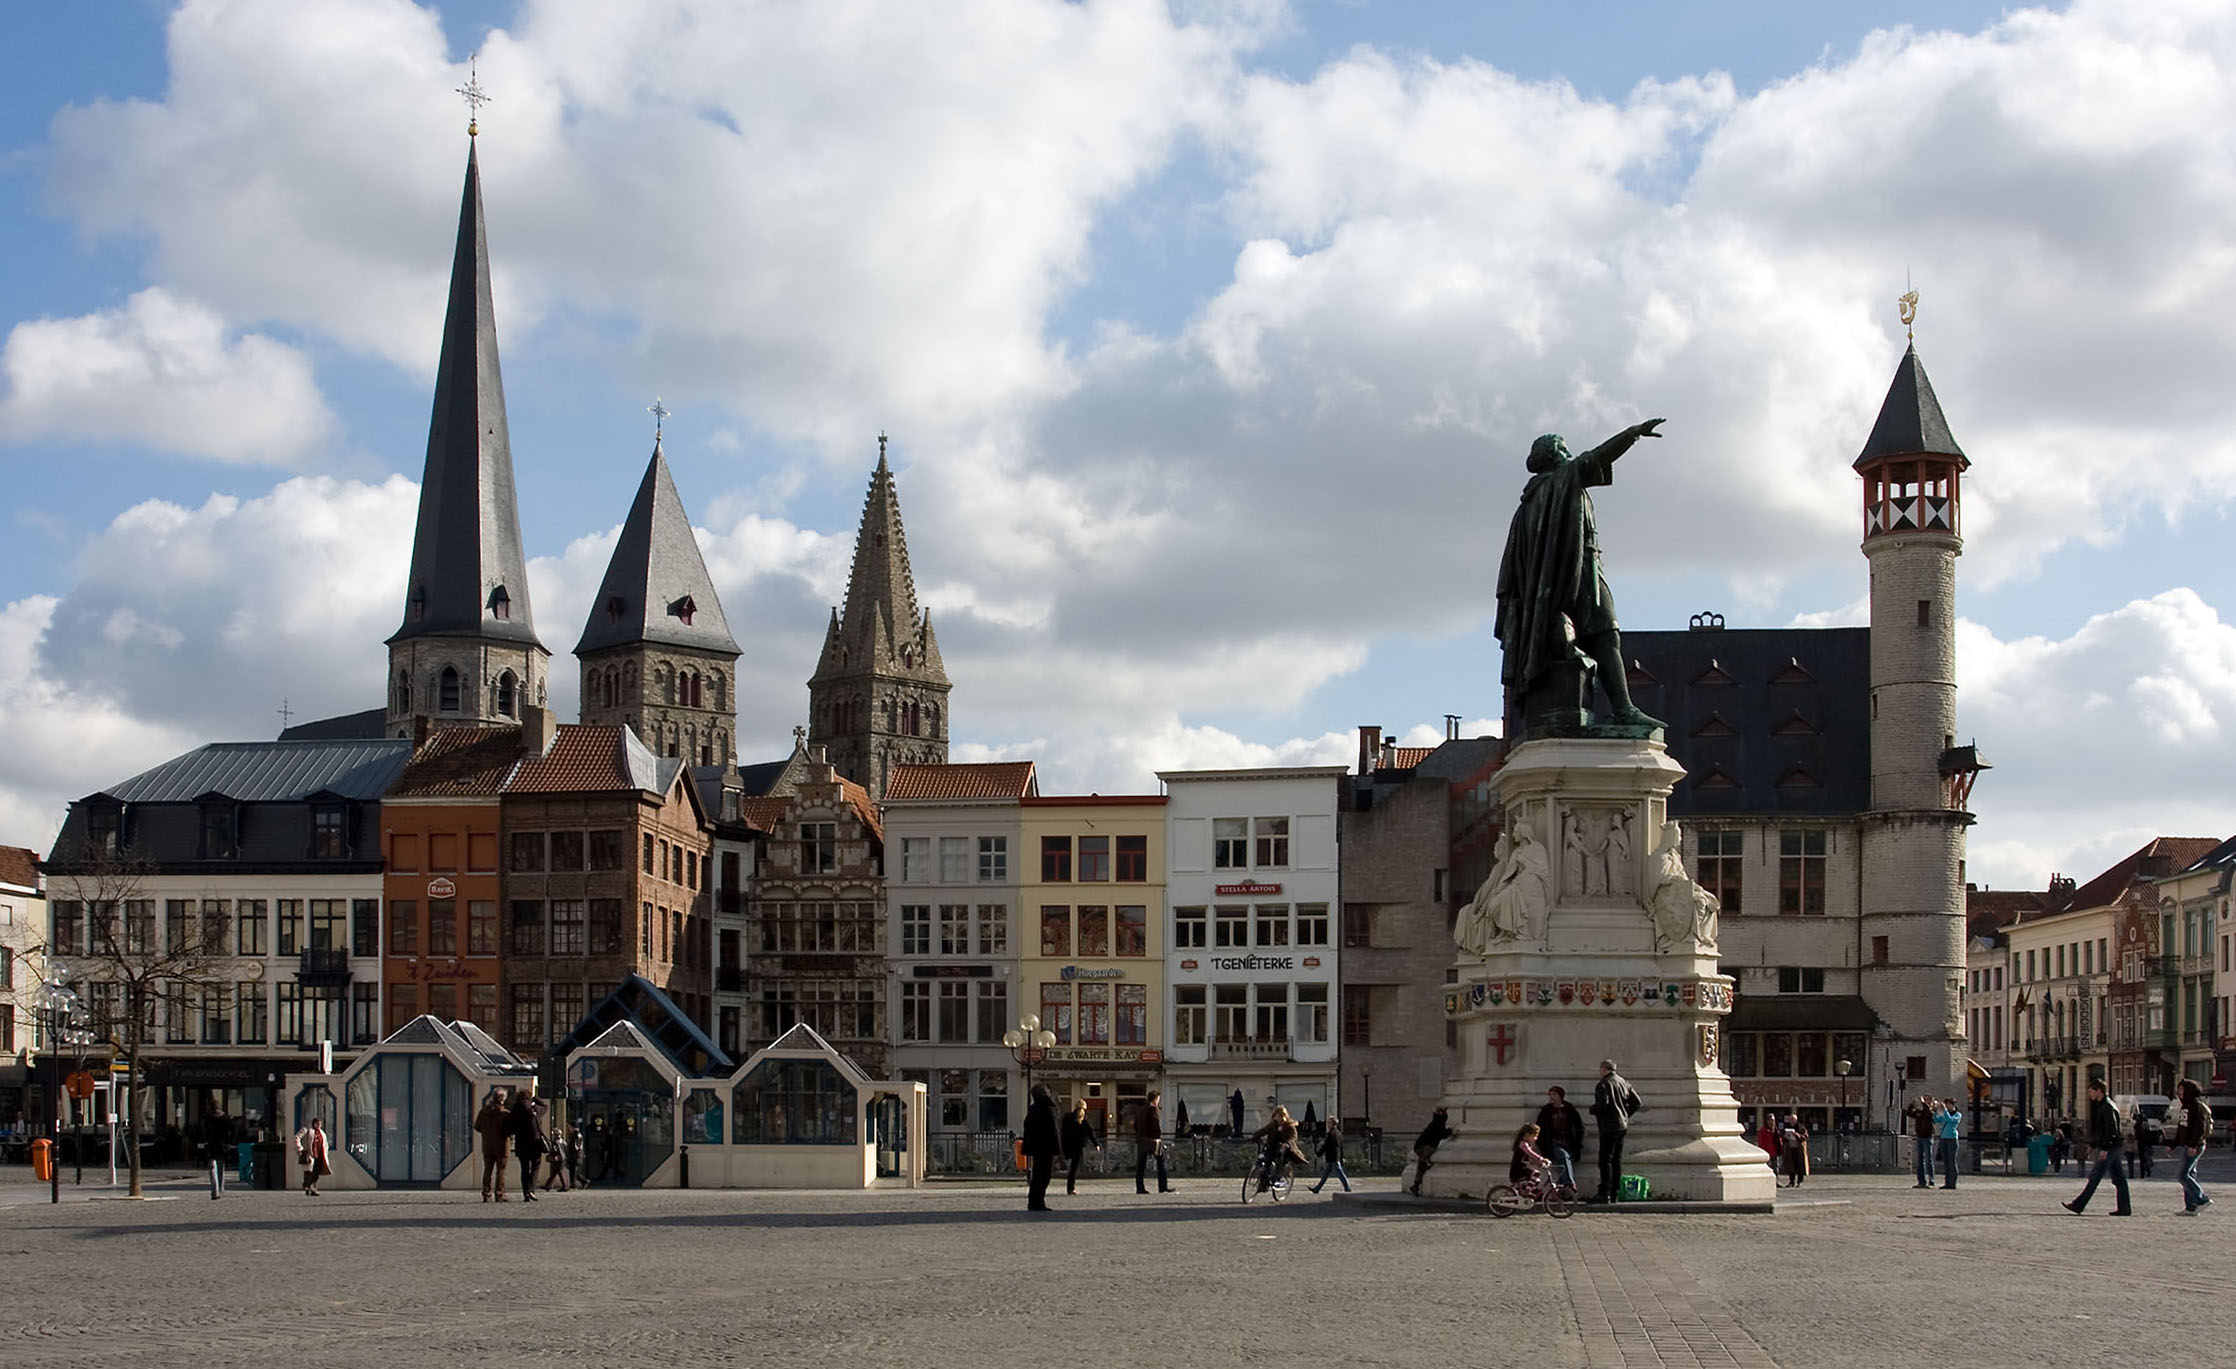 Vrijdagmarkt, Ghent - Wikipedia